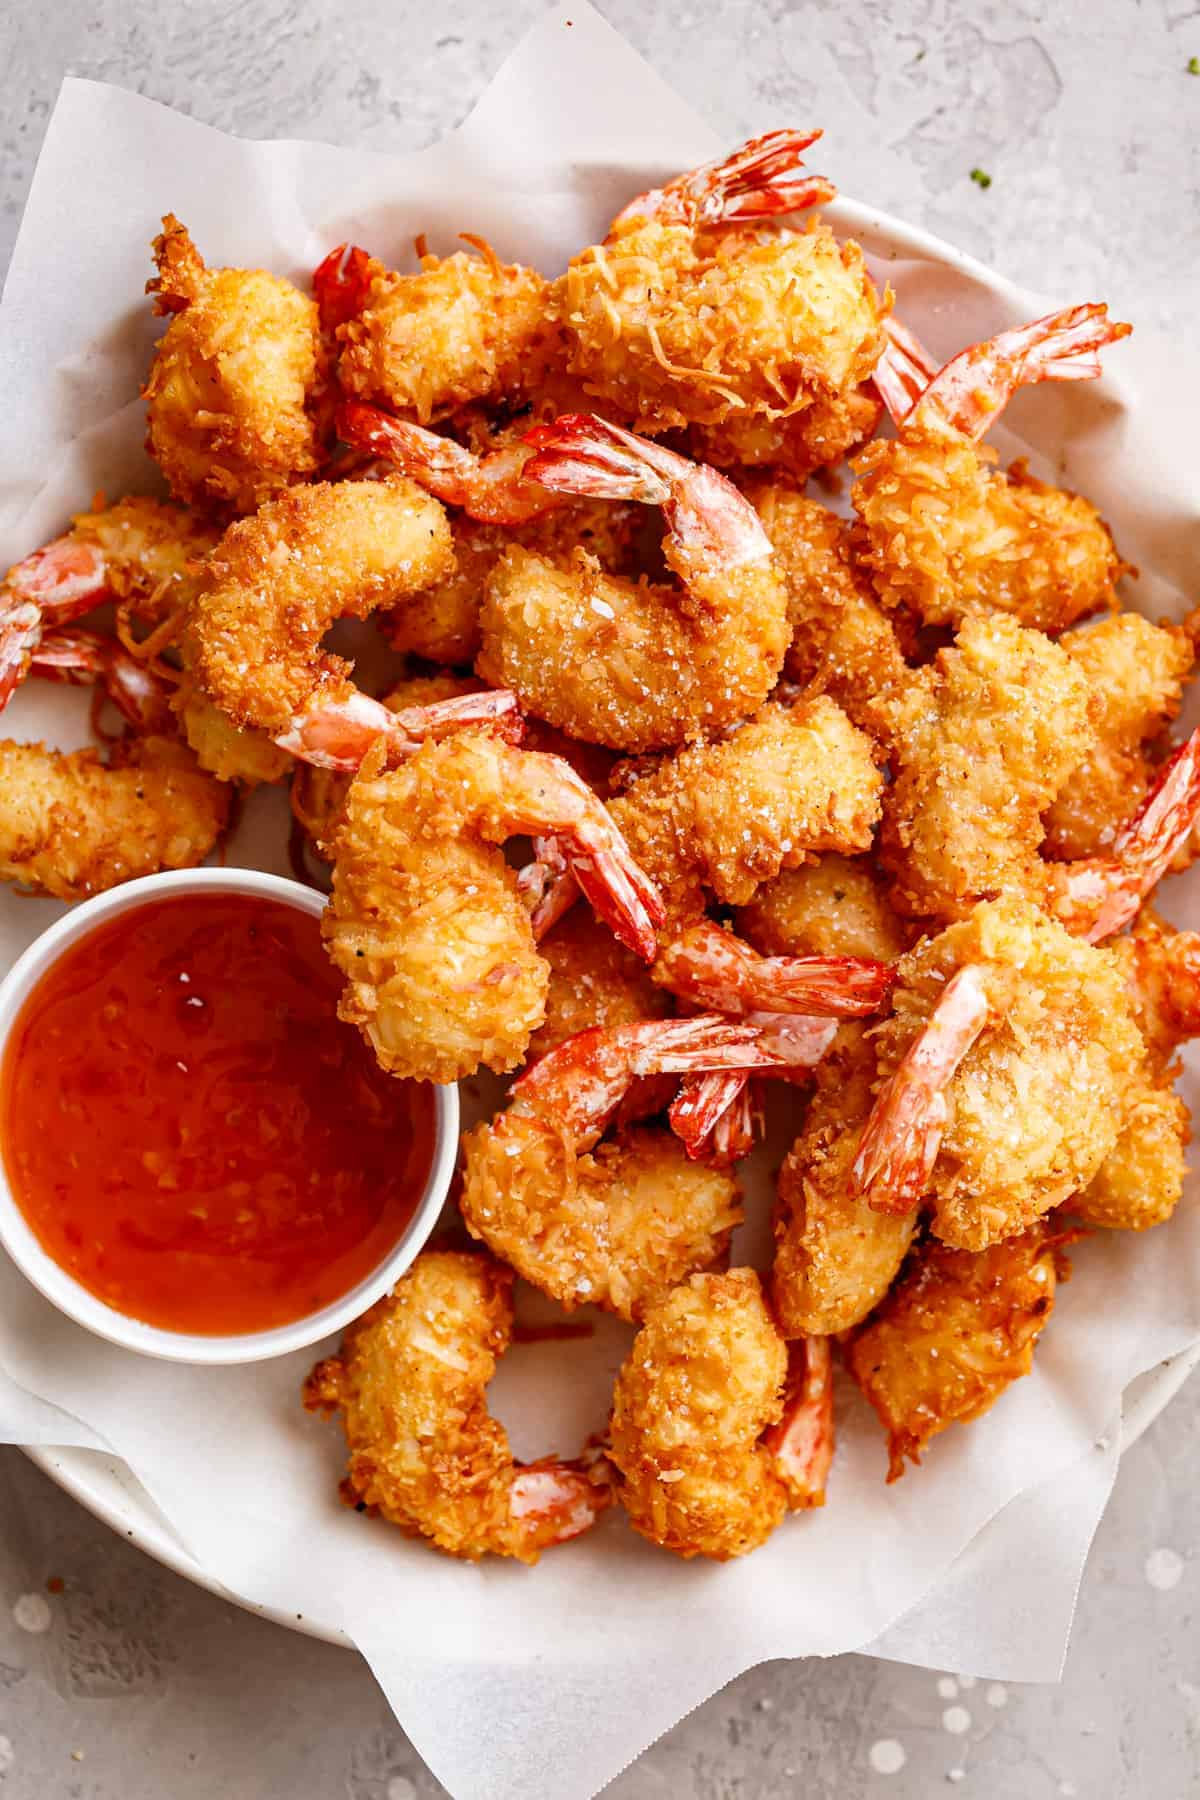 Coconut Shrimp with Mango Habanero Sauce Recipe